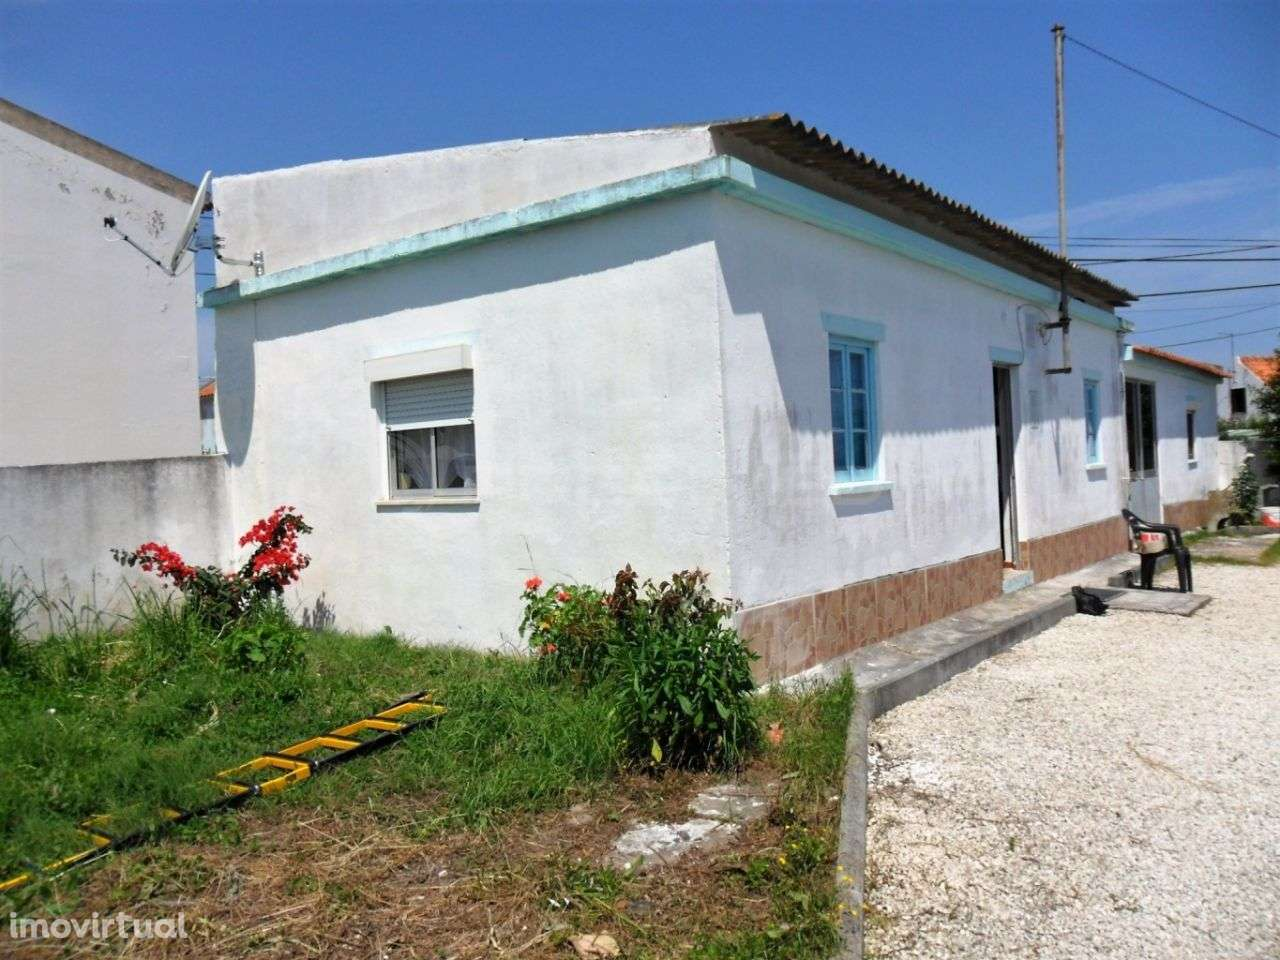 Moradia para comprar, Nadadouro, Leiria - Foto 1